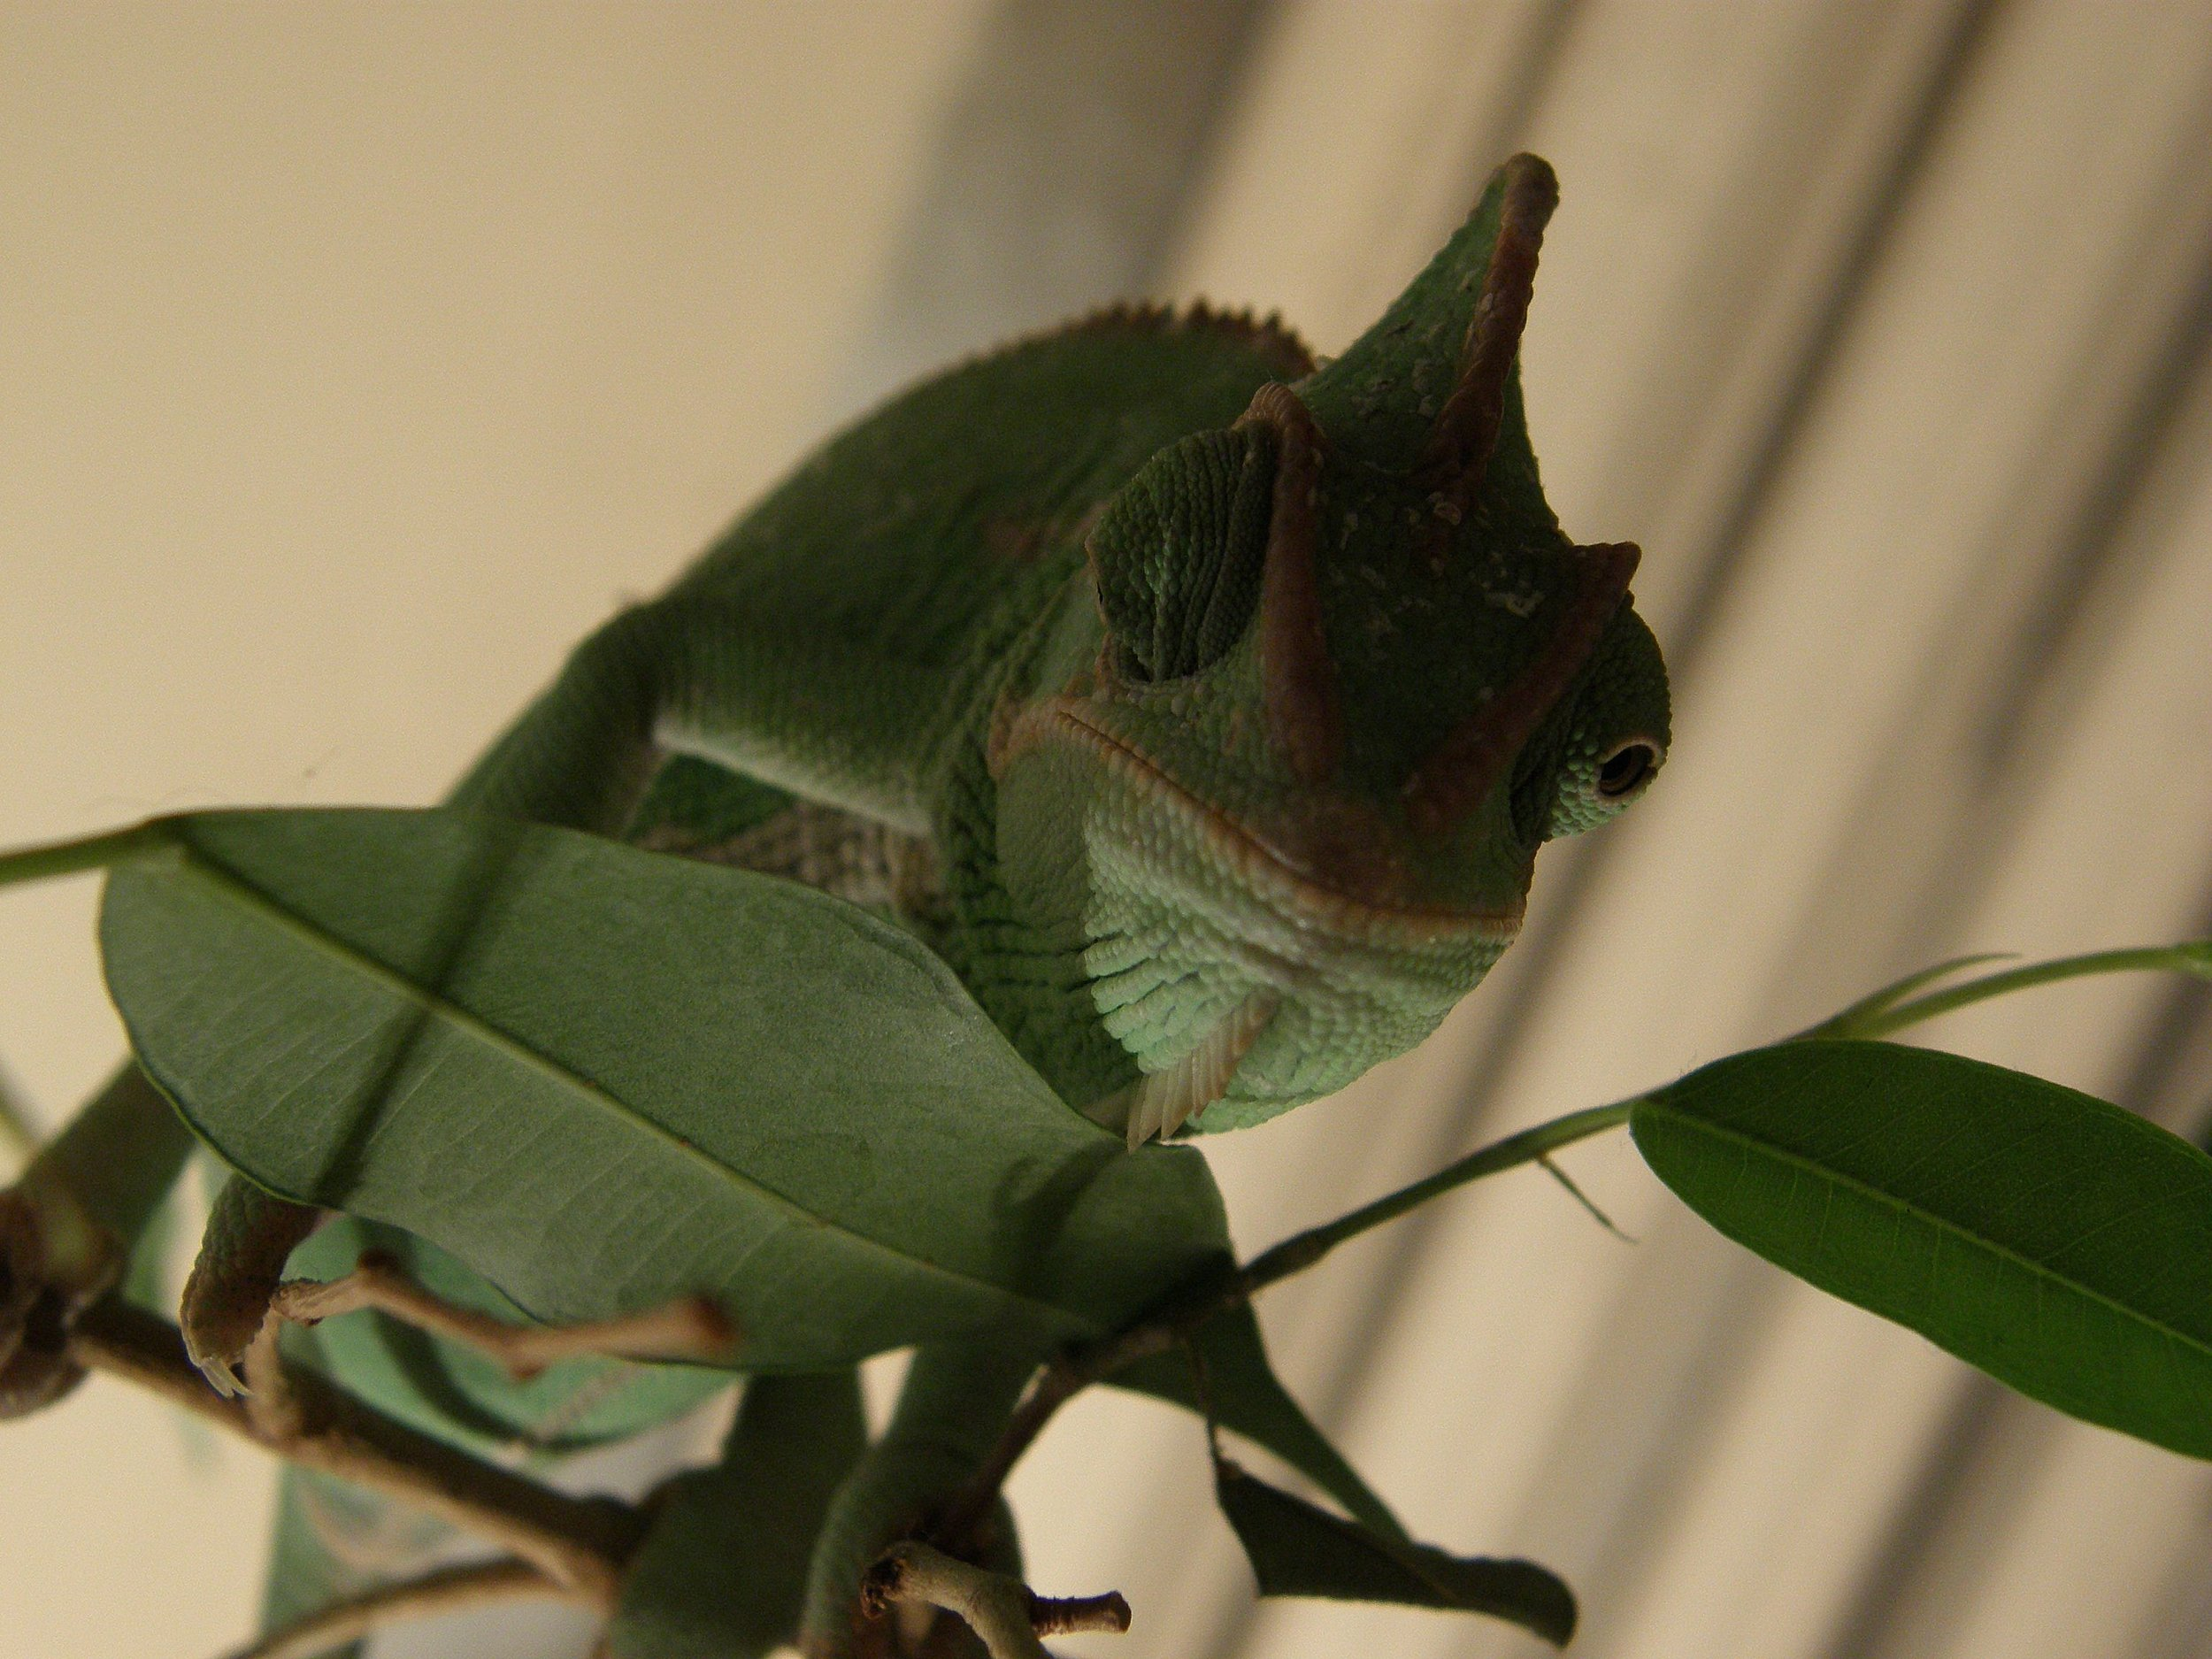 coquettish-chameleon-1359593.jpg